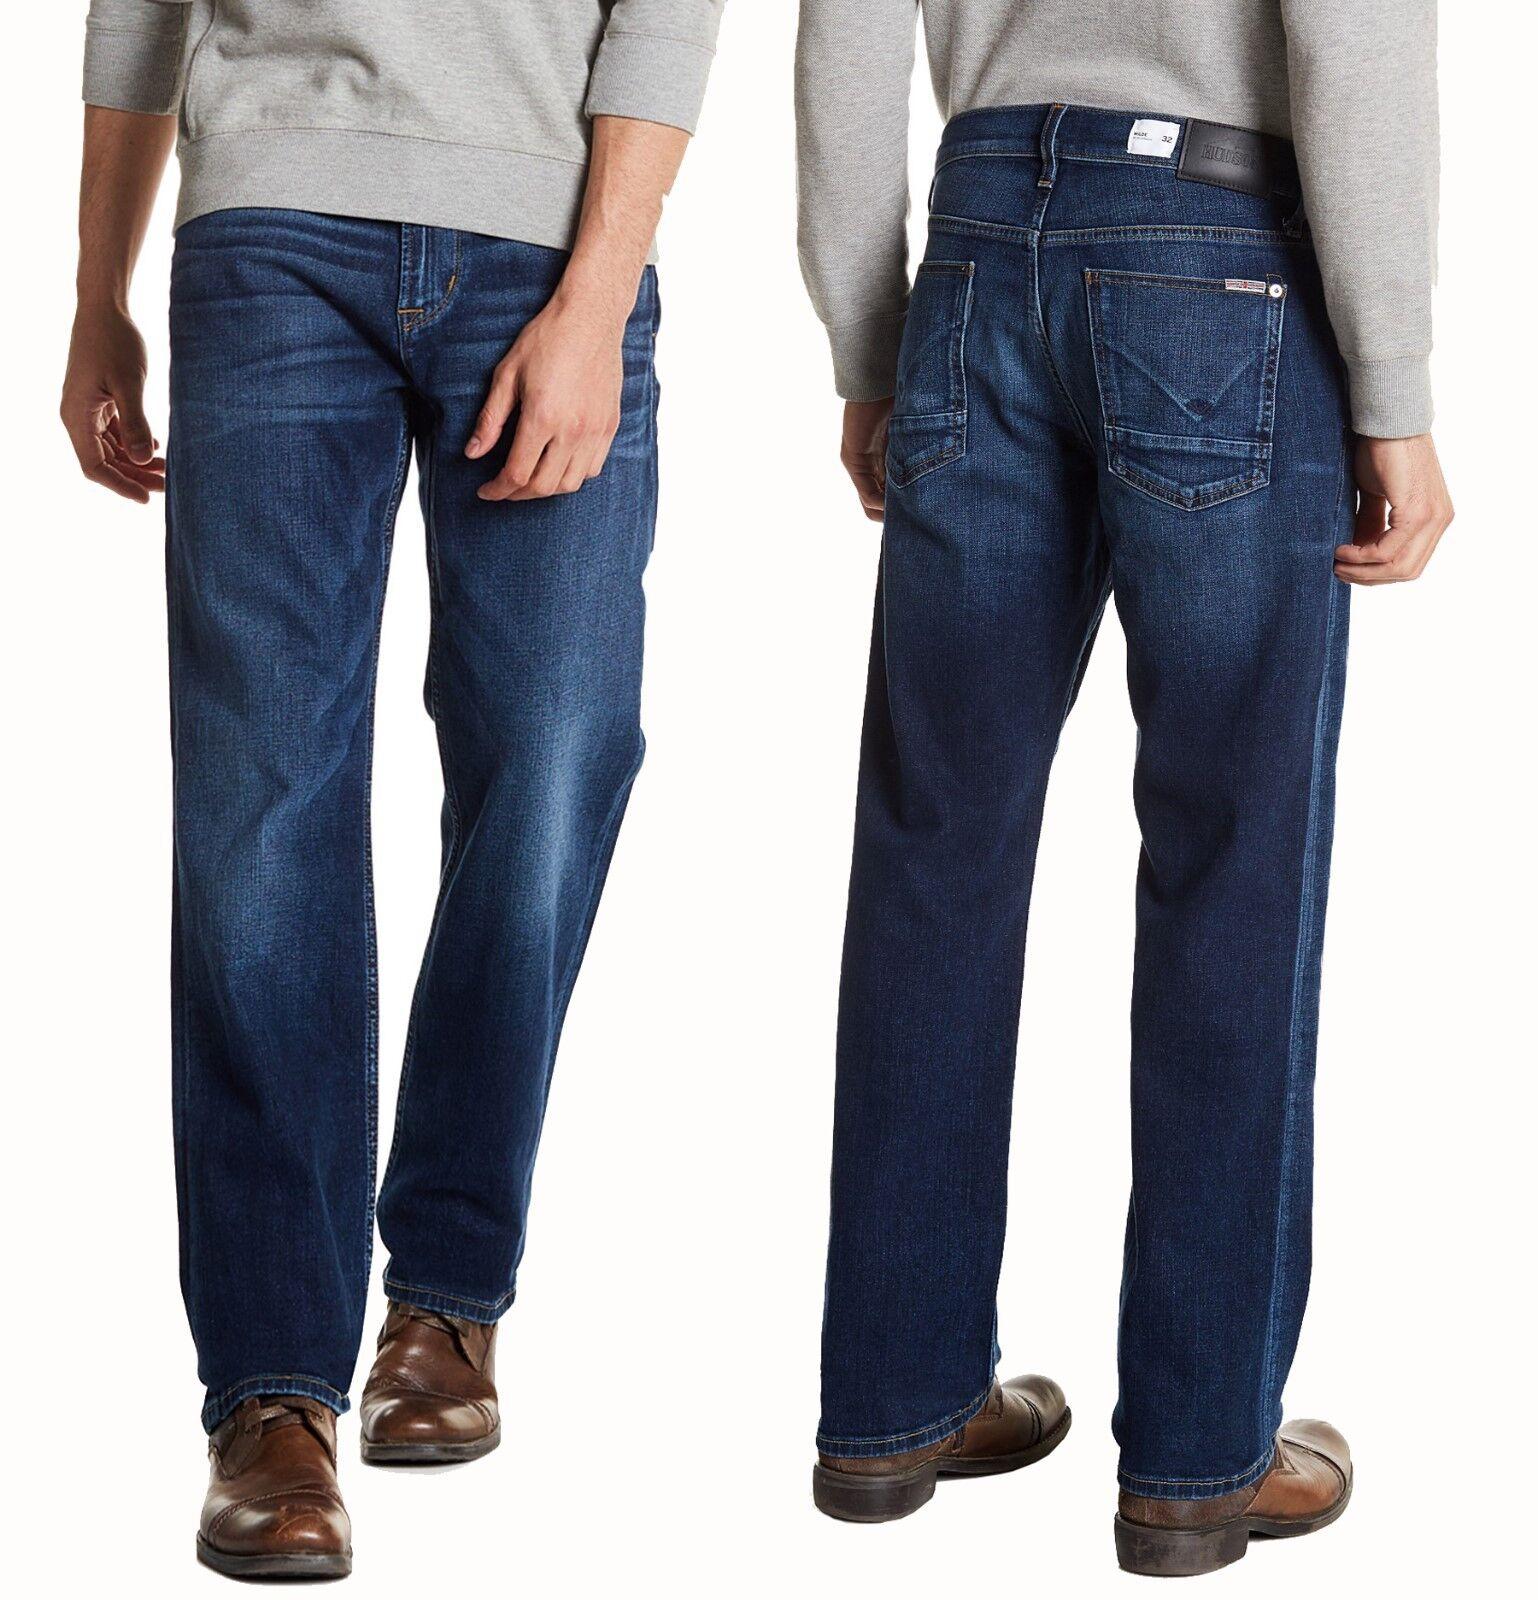 HUDSON Wilde Relax Straight bluee Denim Jeans 33X34  NWT